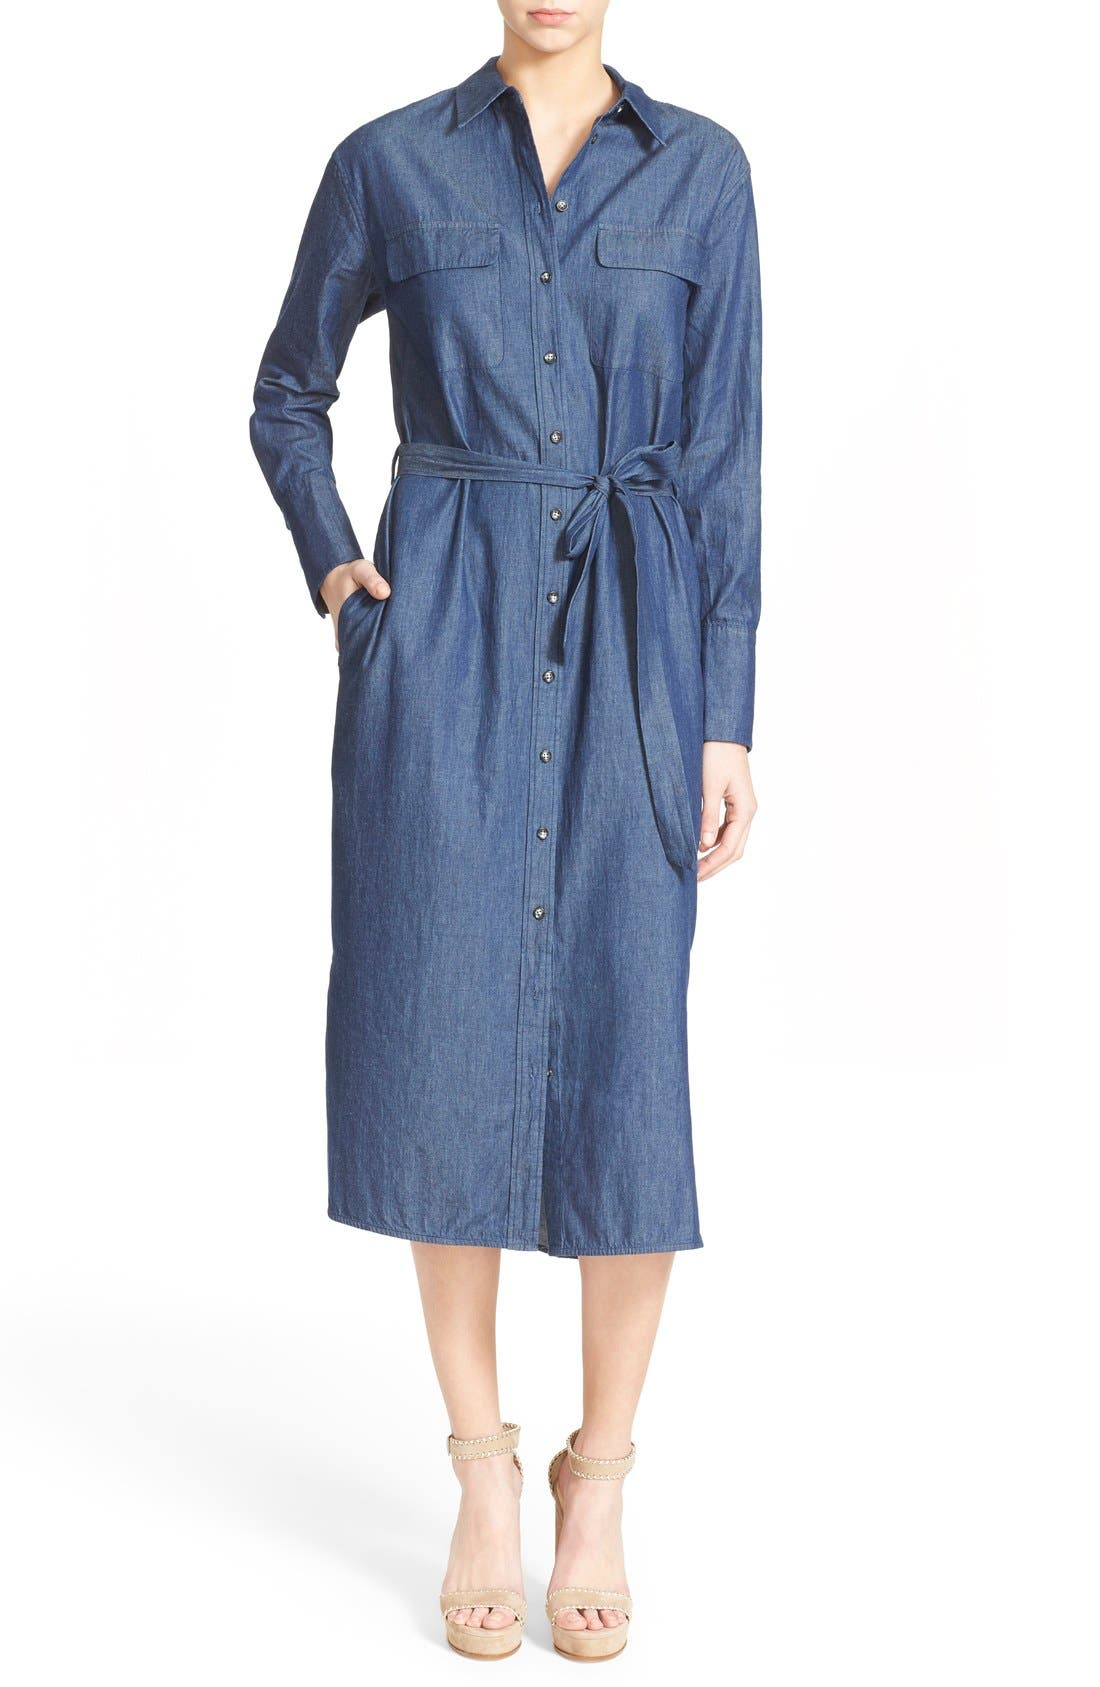 Main Image - Equipment 'Delany' Chambray Cotton Shirtdress